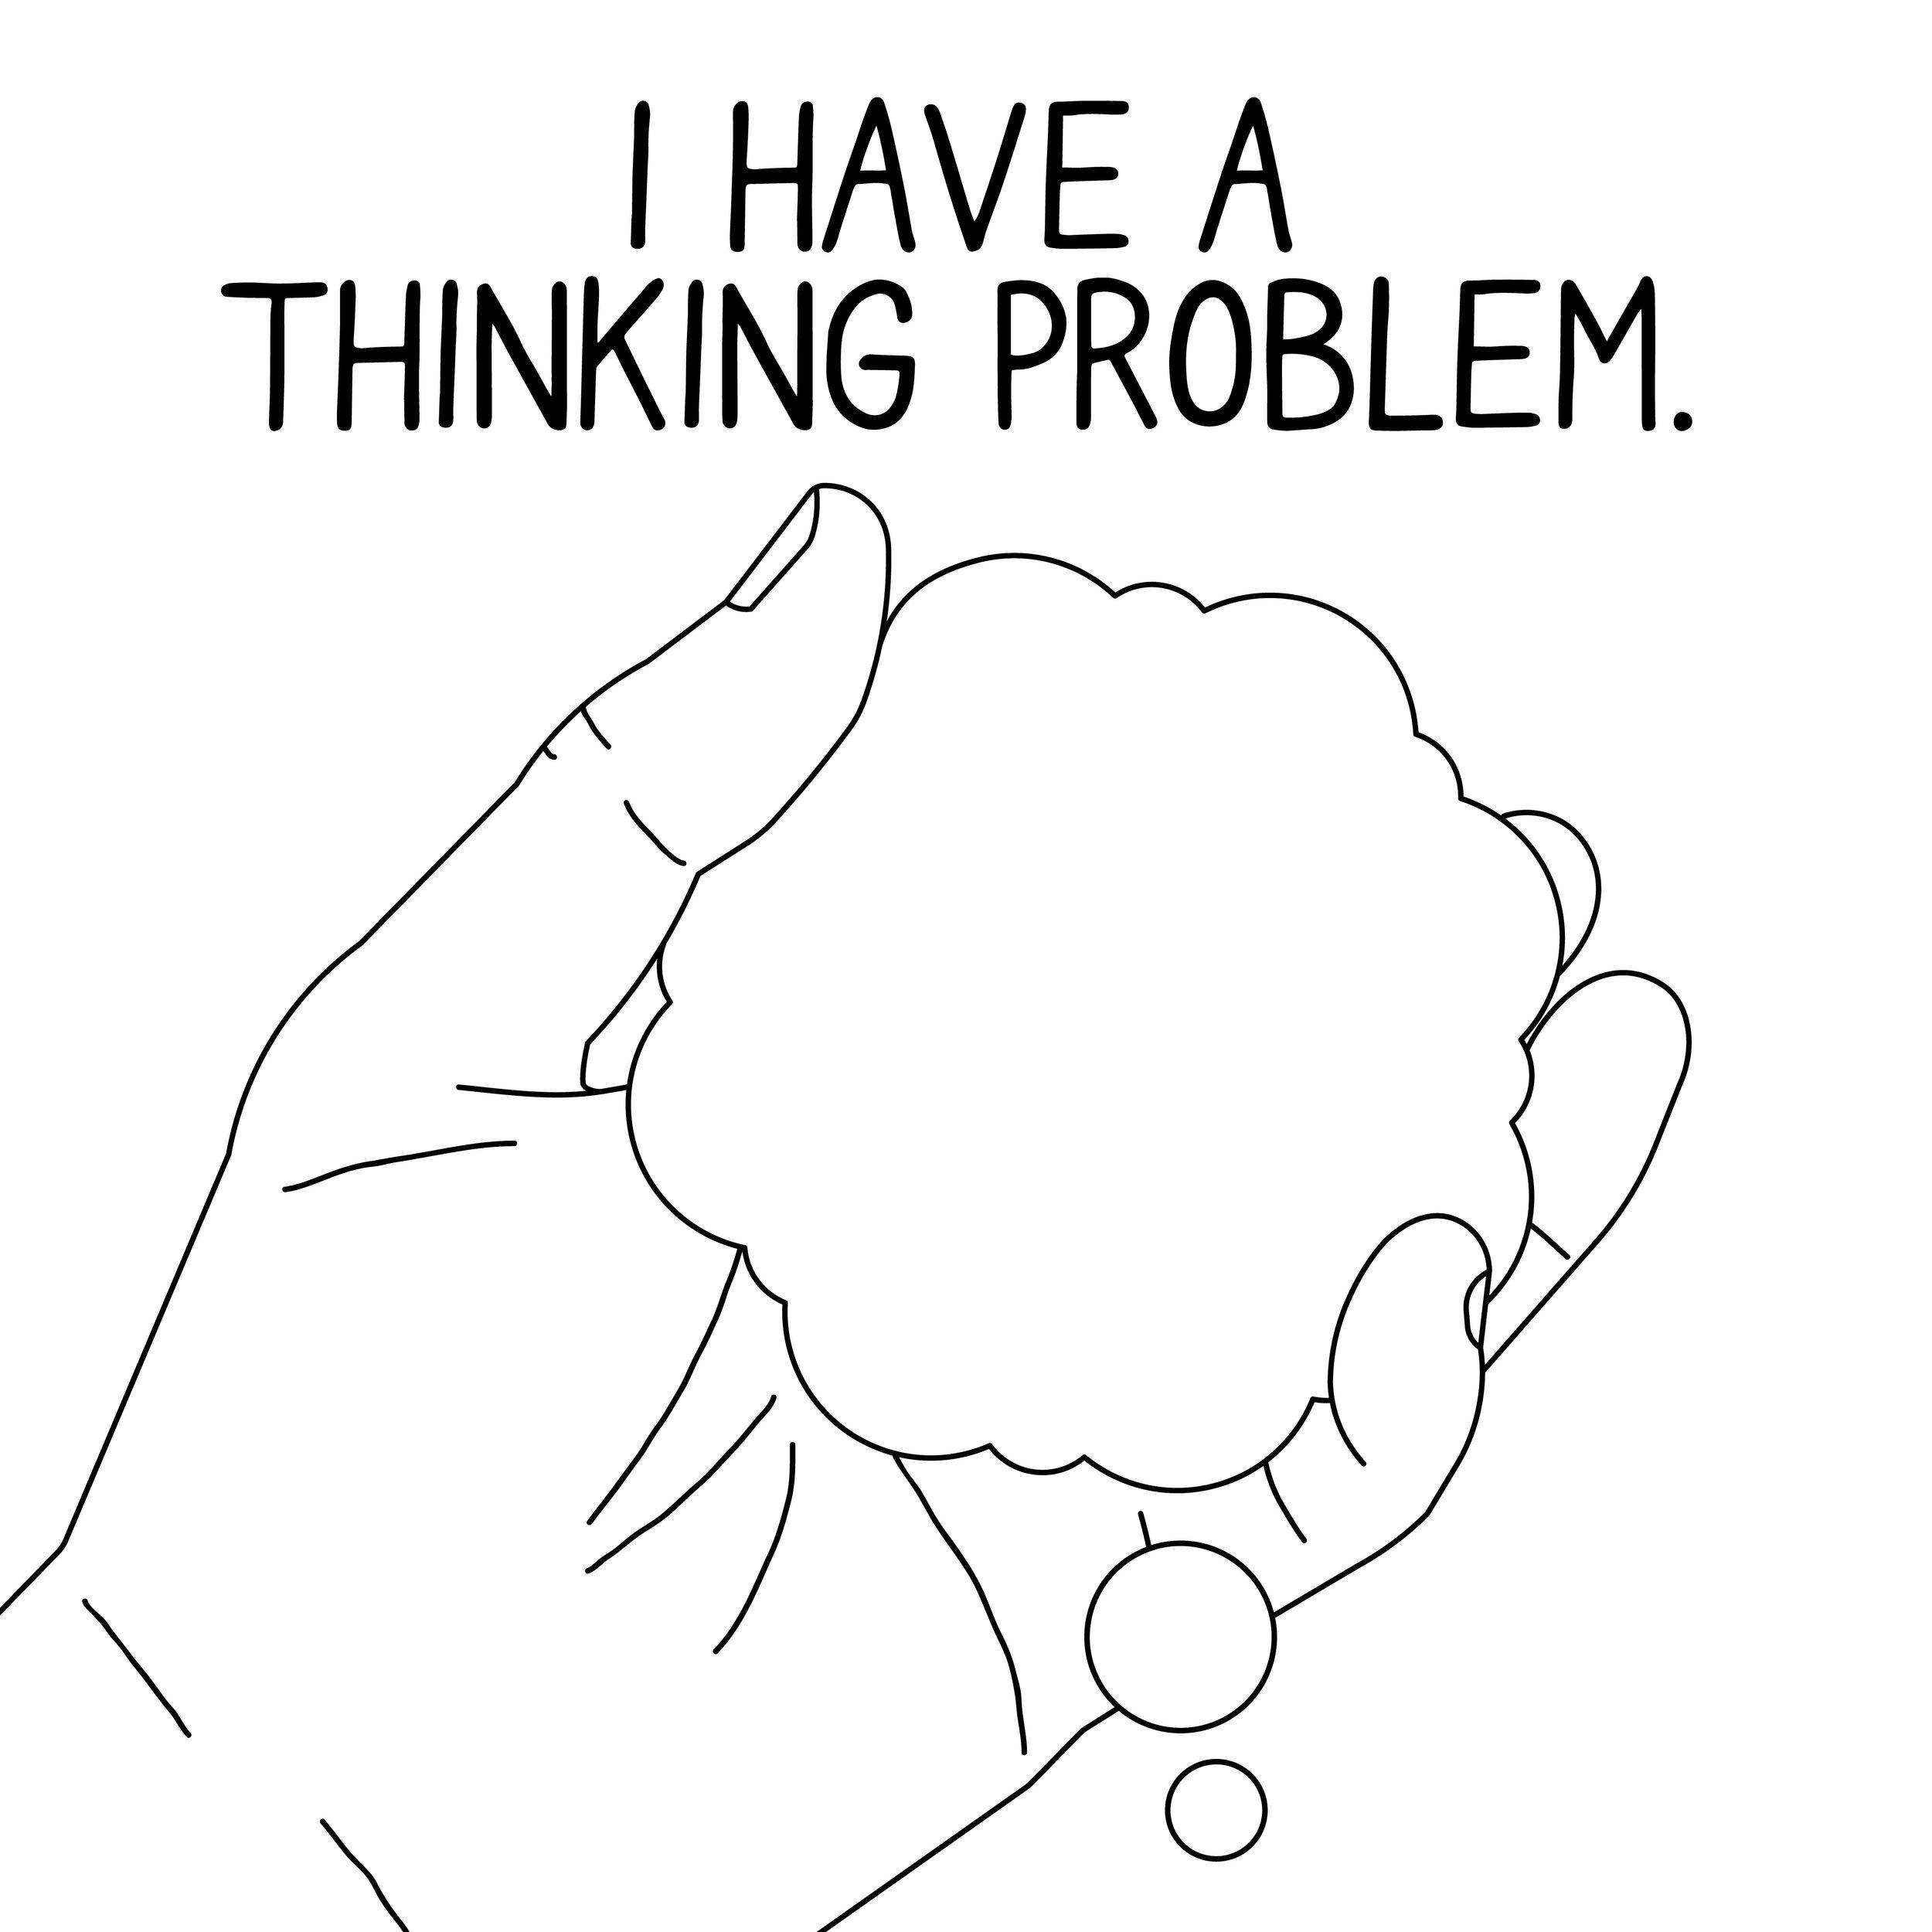 thinkingproblem-01.jpg